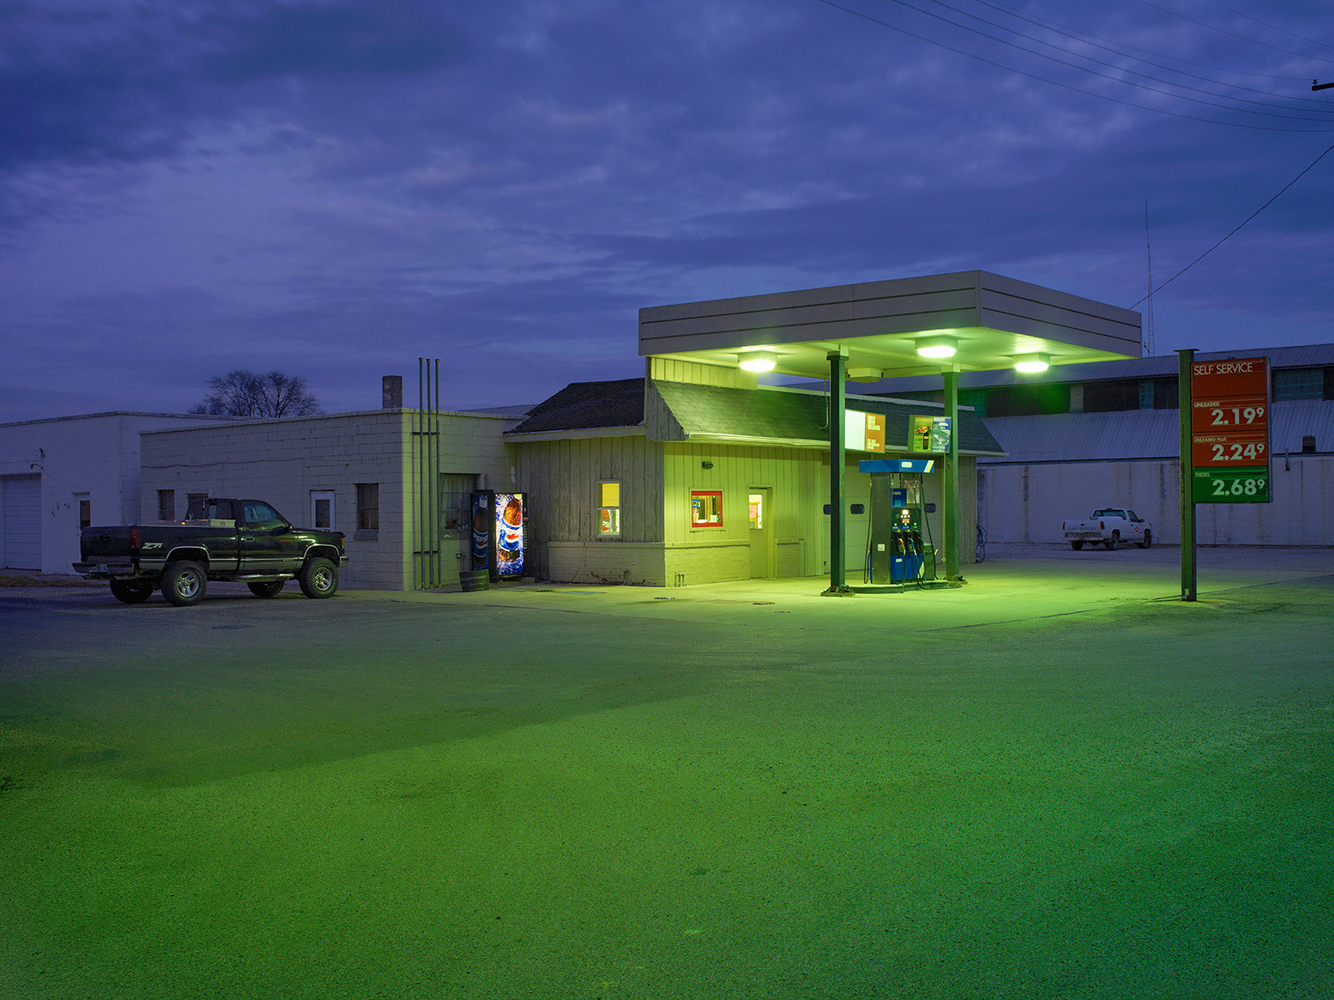 Single Pump Generic Gas Station, Allerton, IL 2006